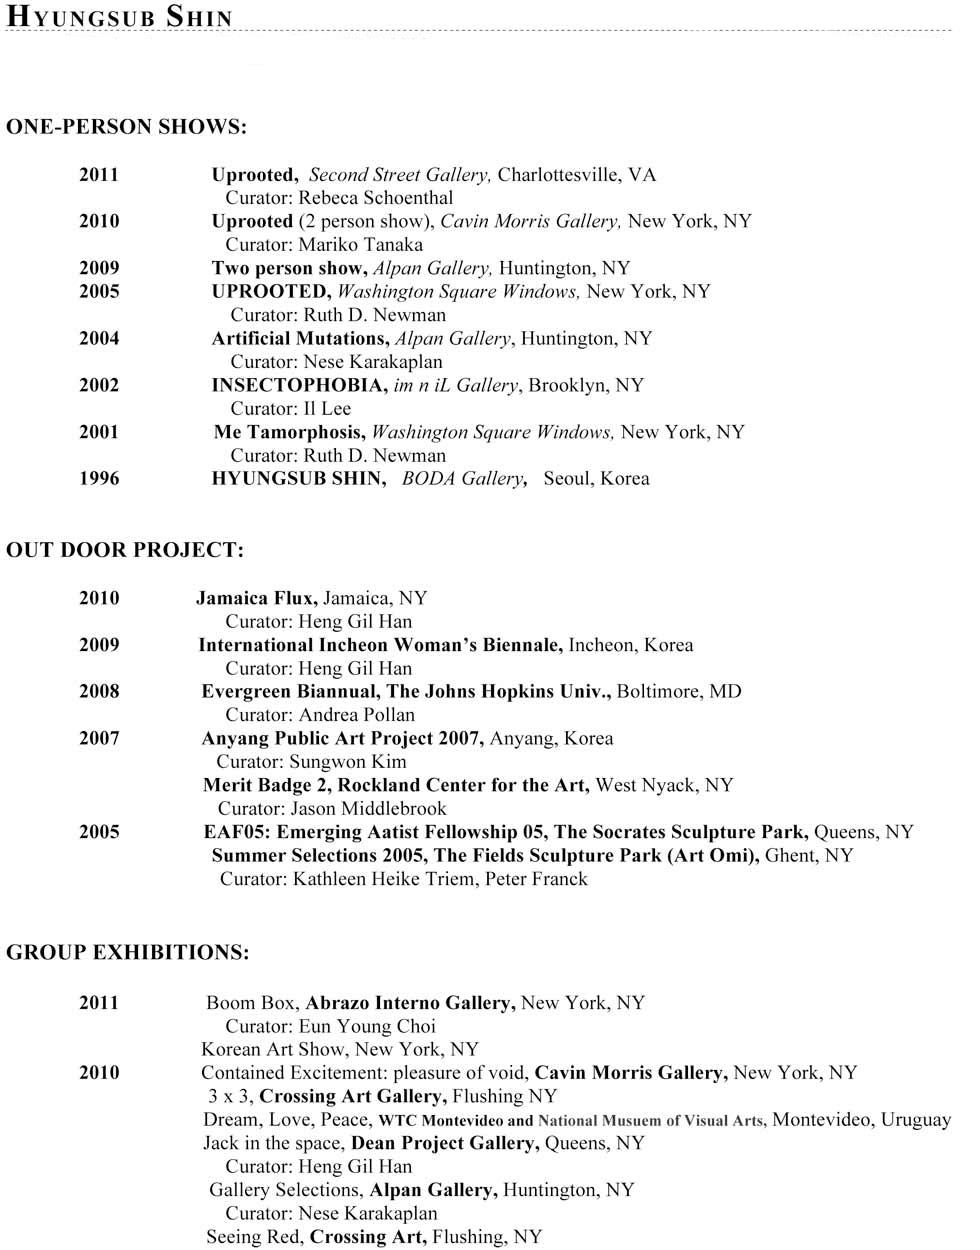 Artist Resume, 2011